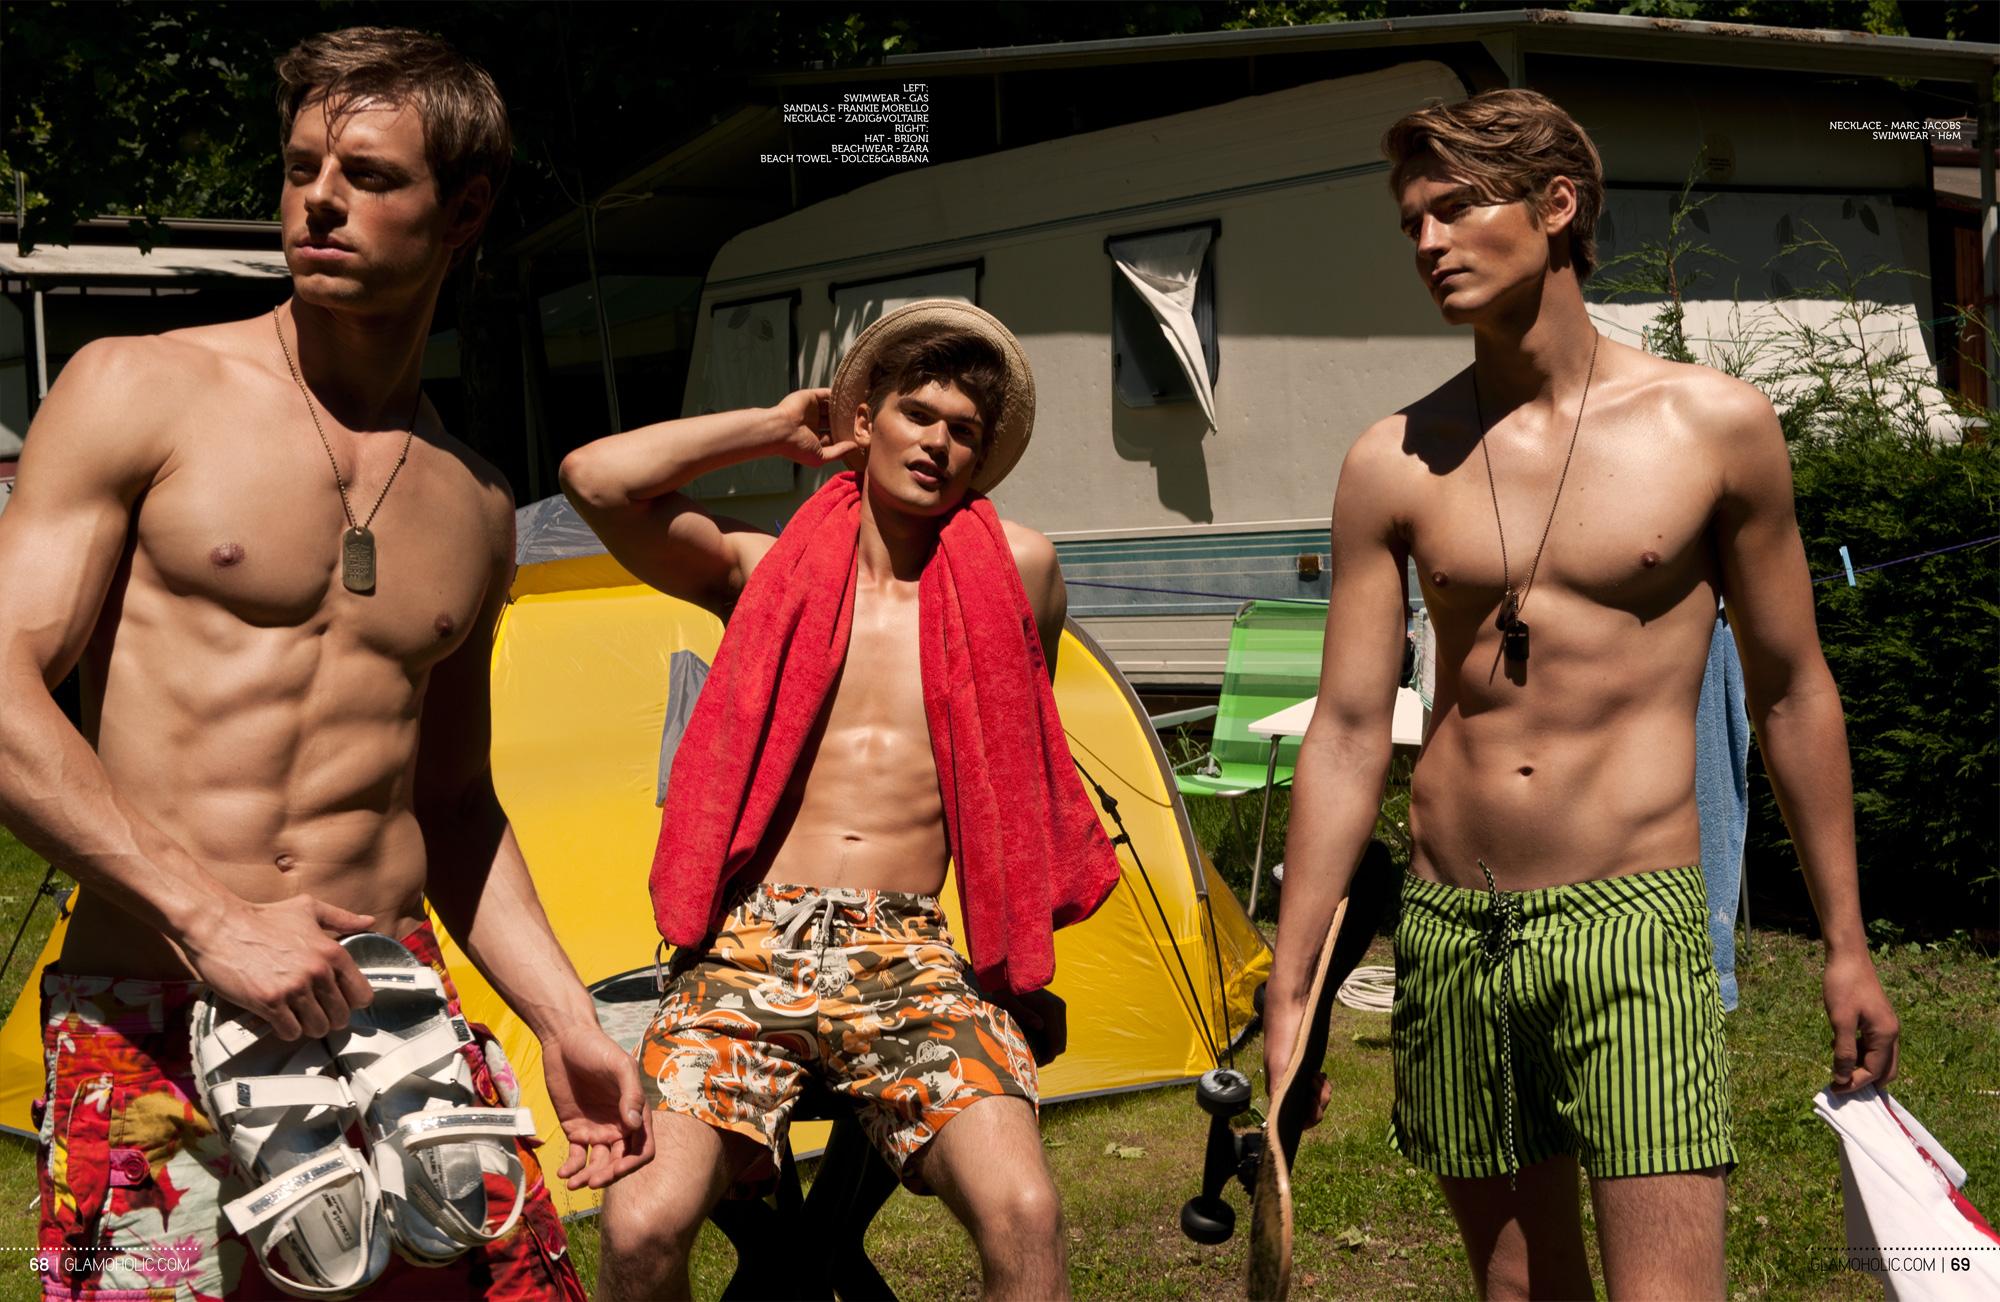 Hello Sun! Anton Worman, Jon Hjelholt + Martin Pichler Model Swimwear for Glamoholic